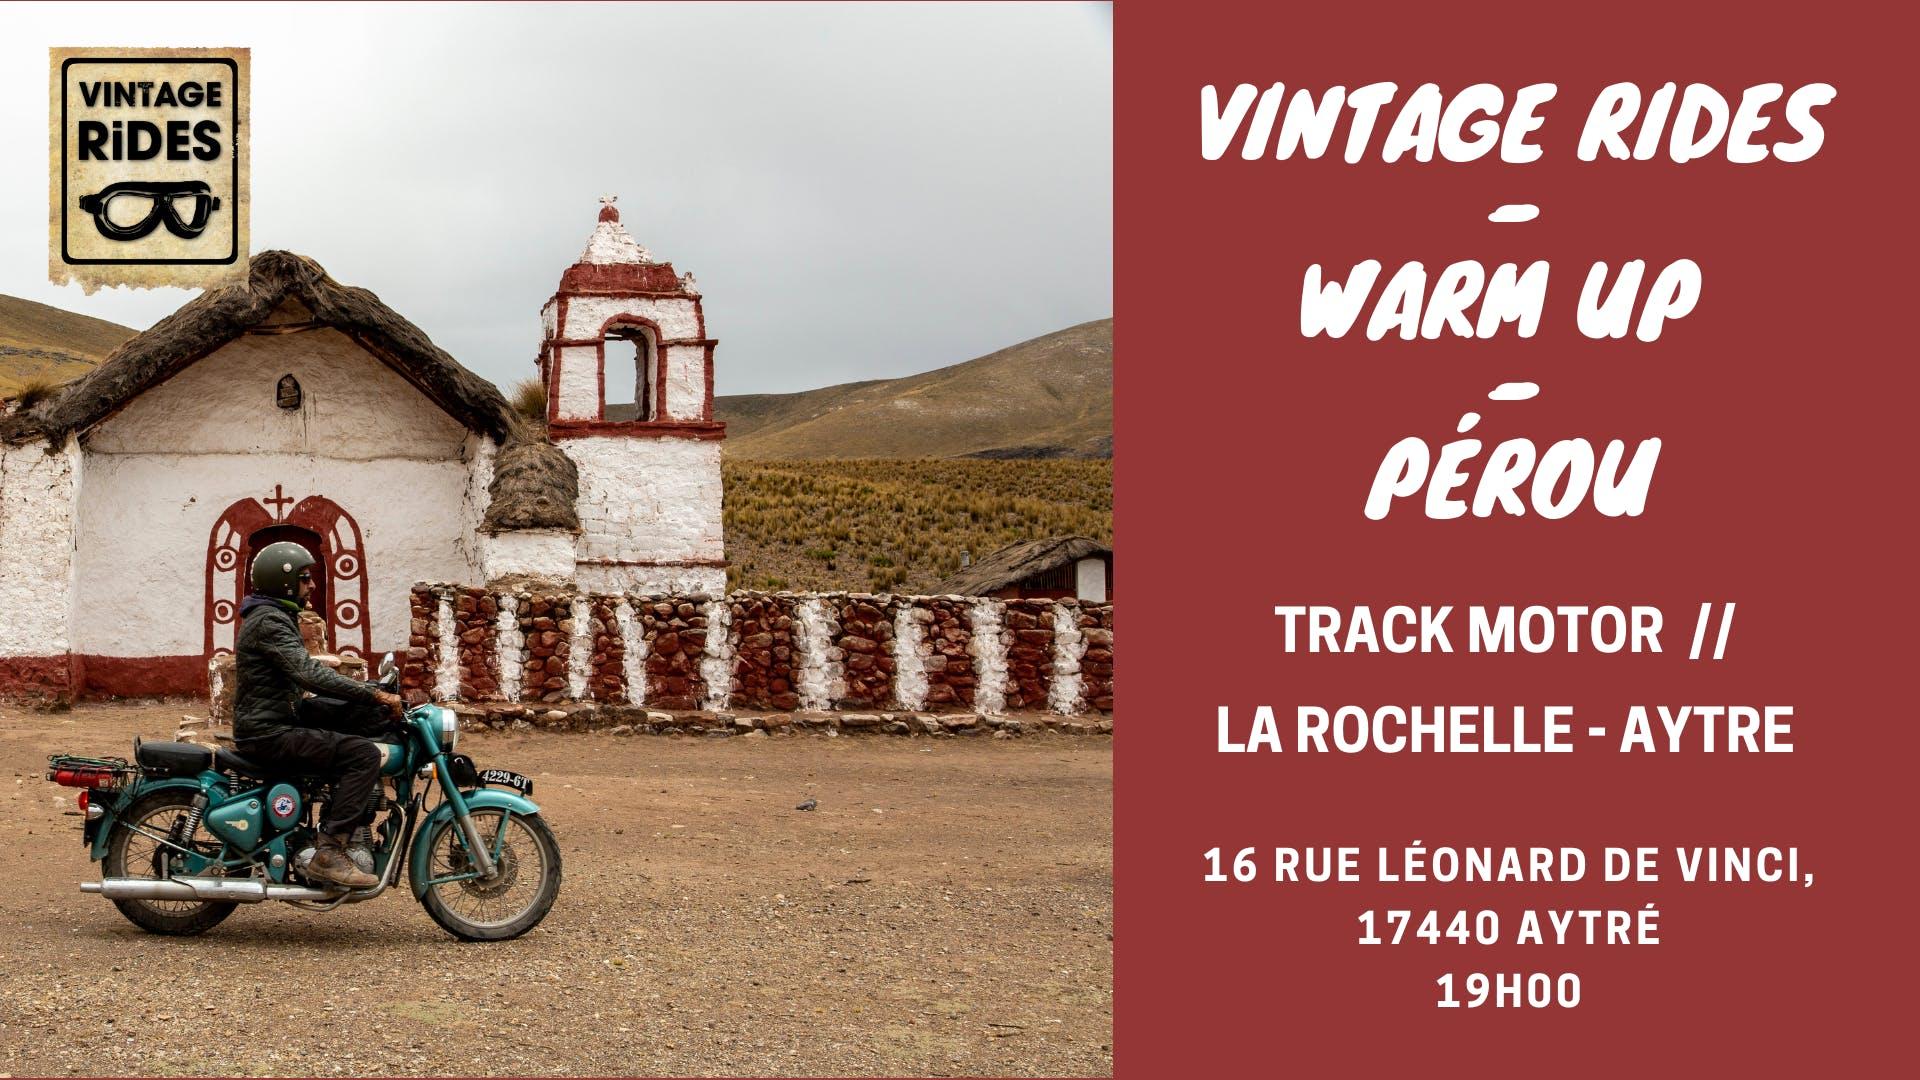 Warm up La Rochelle - Aytré // Track Motor :